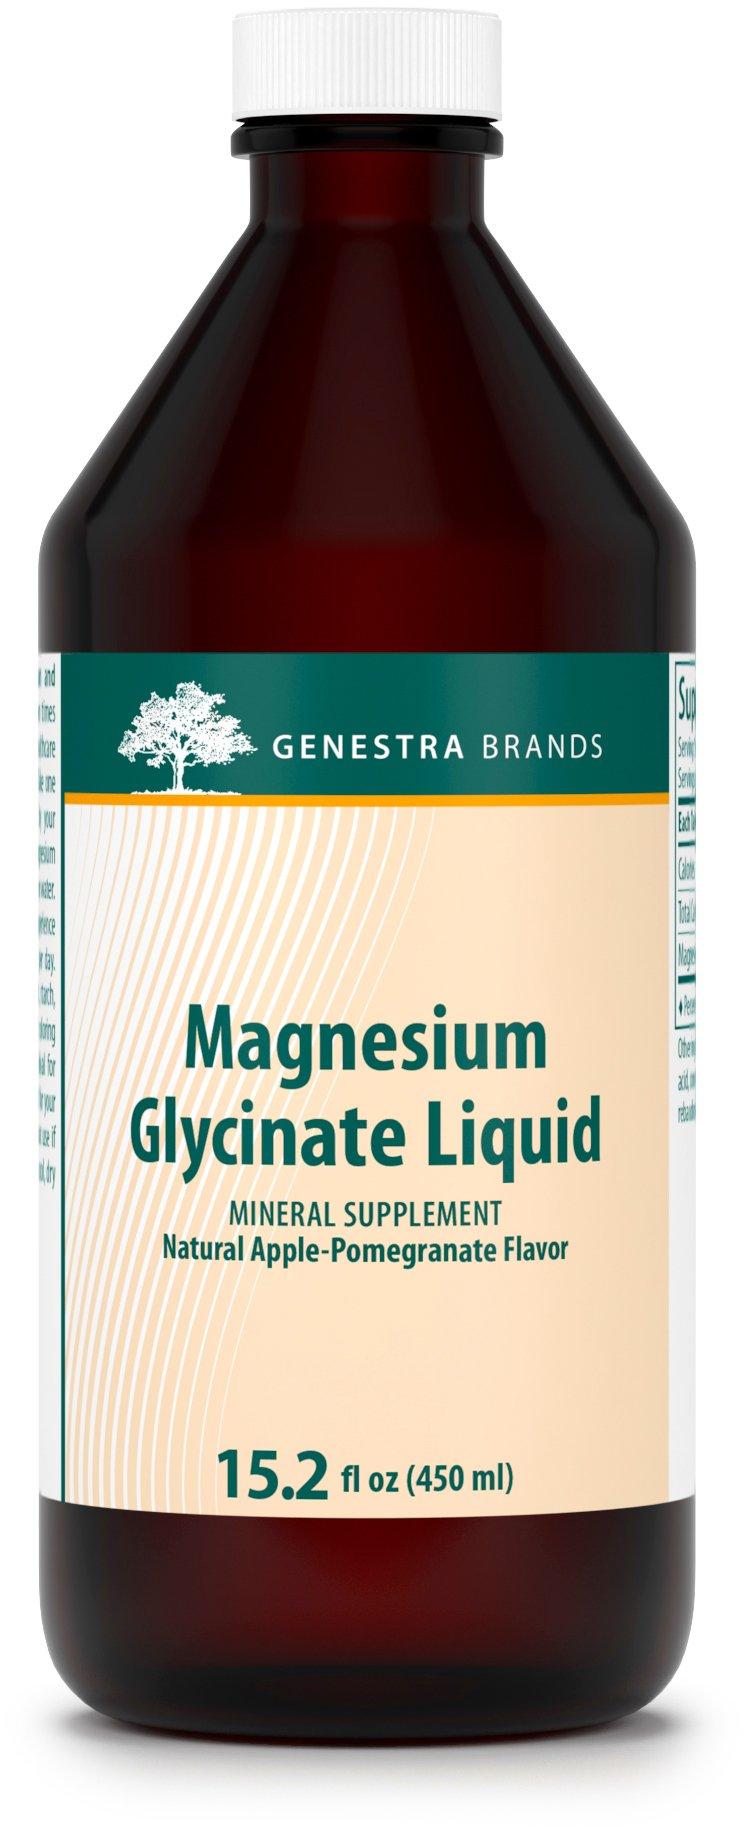 Genestra Brands - Magnesium Glycinate Liquid - Apple Pomegranate Flavor - 15.2 fl. oz.